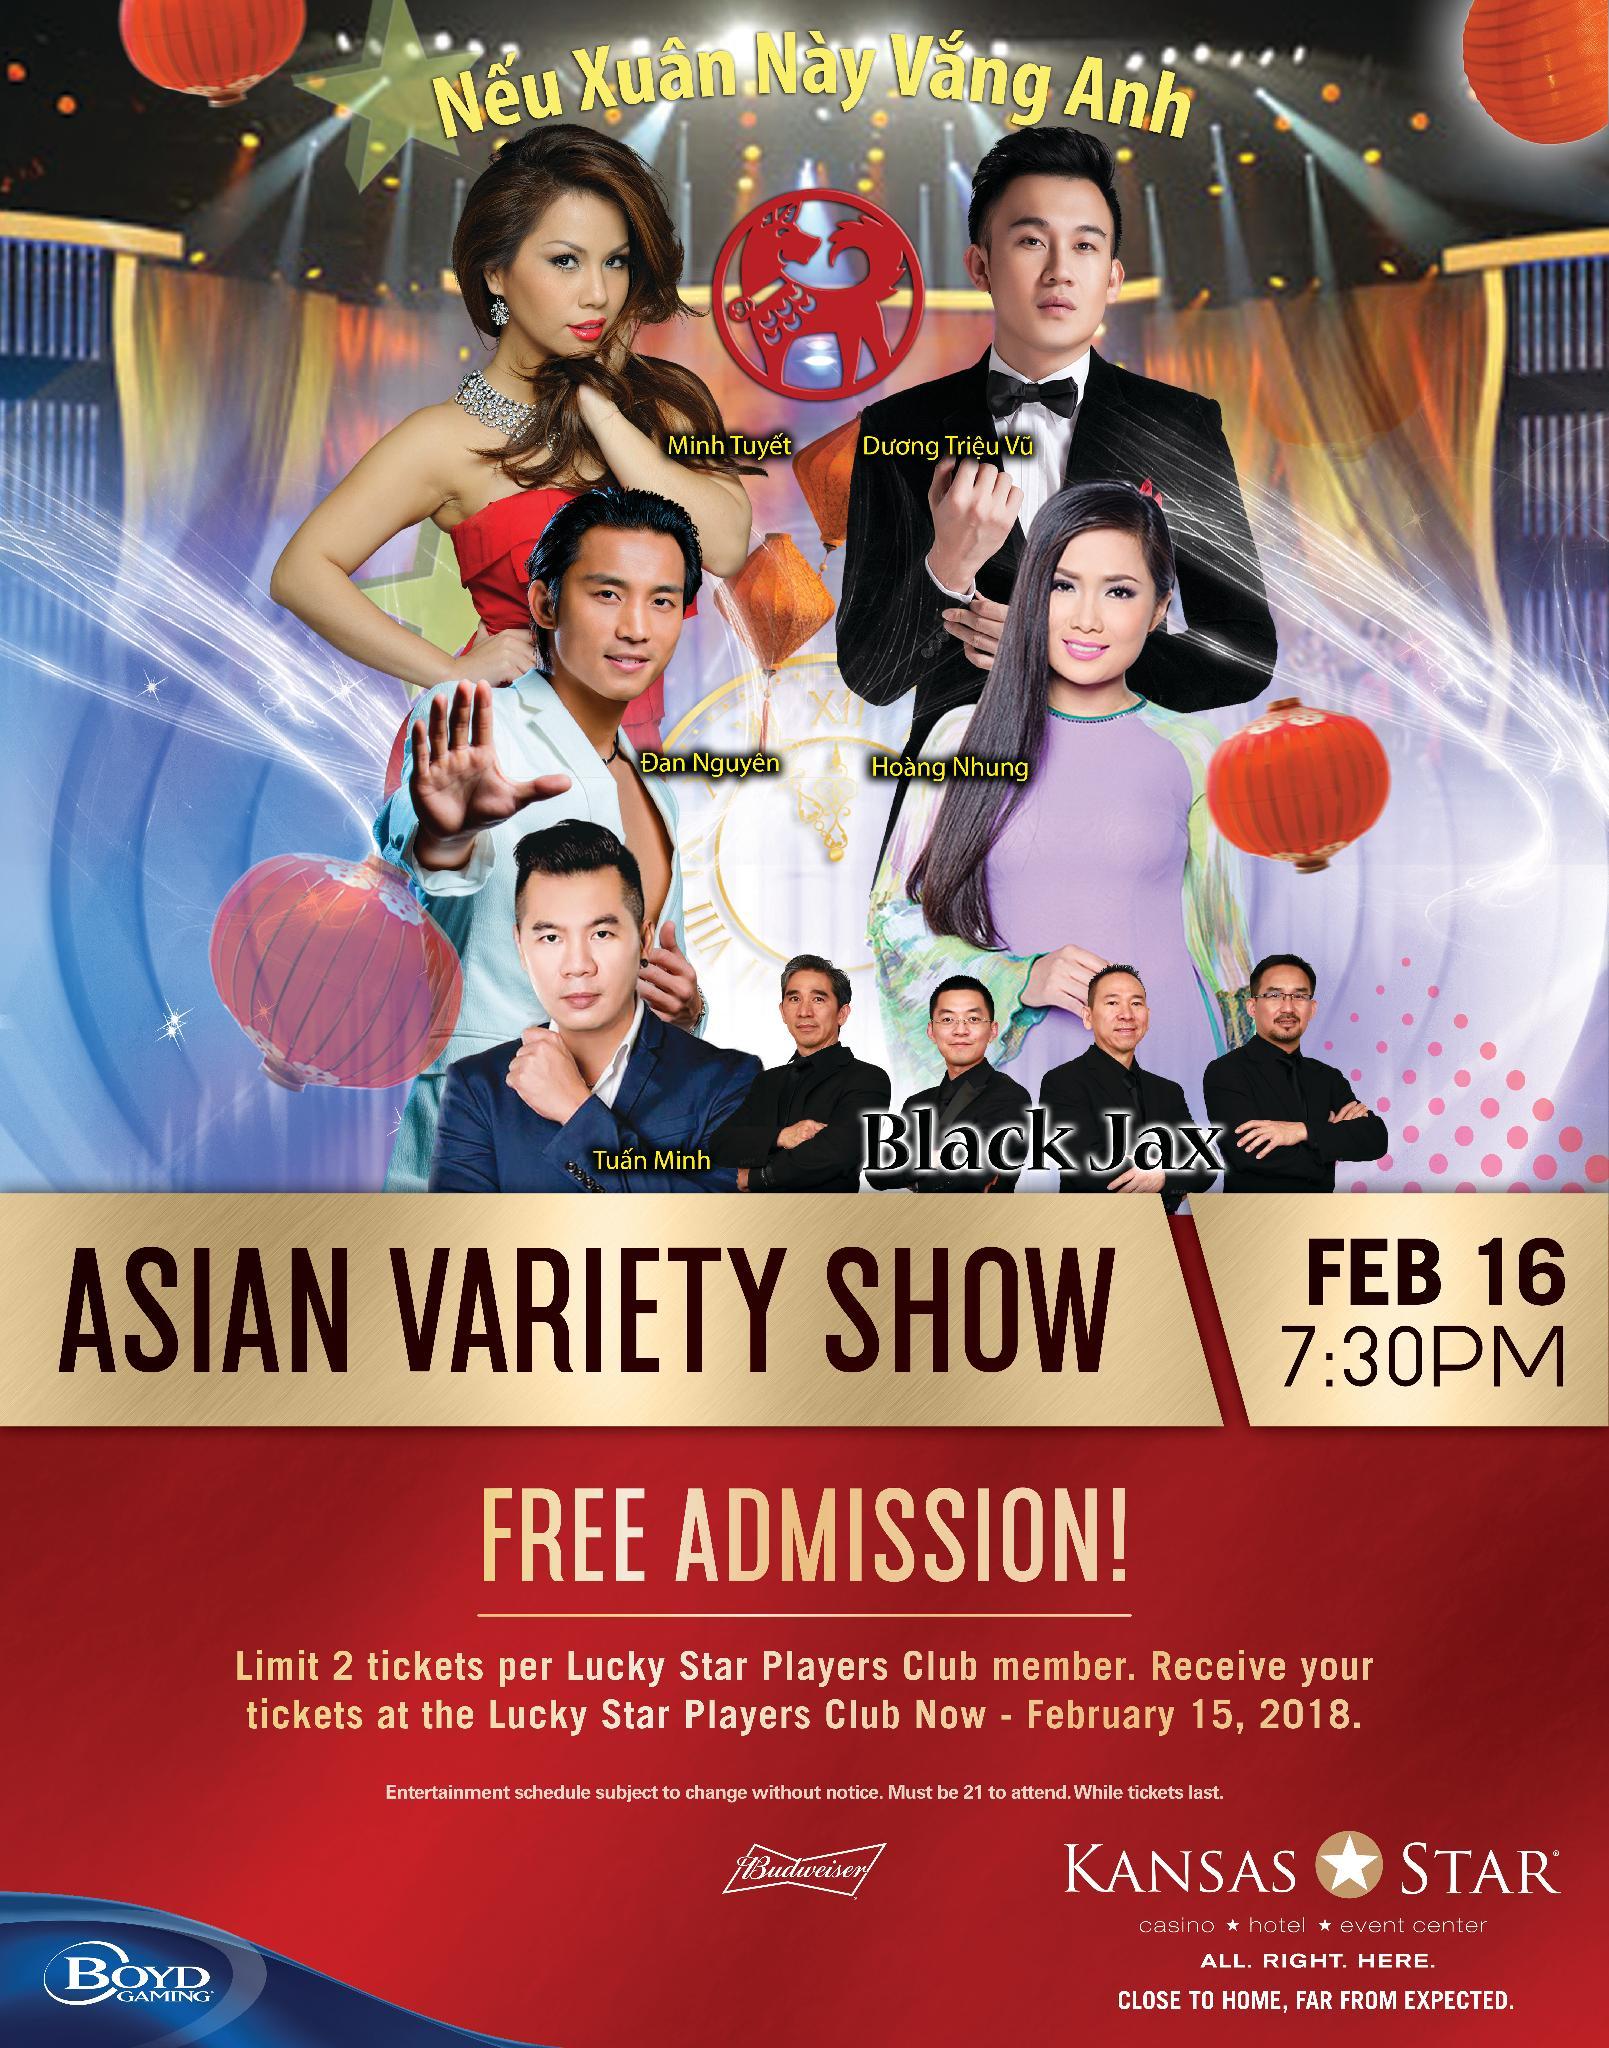 Asian varitey show